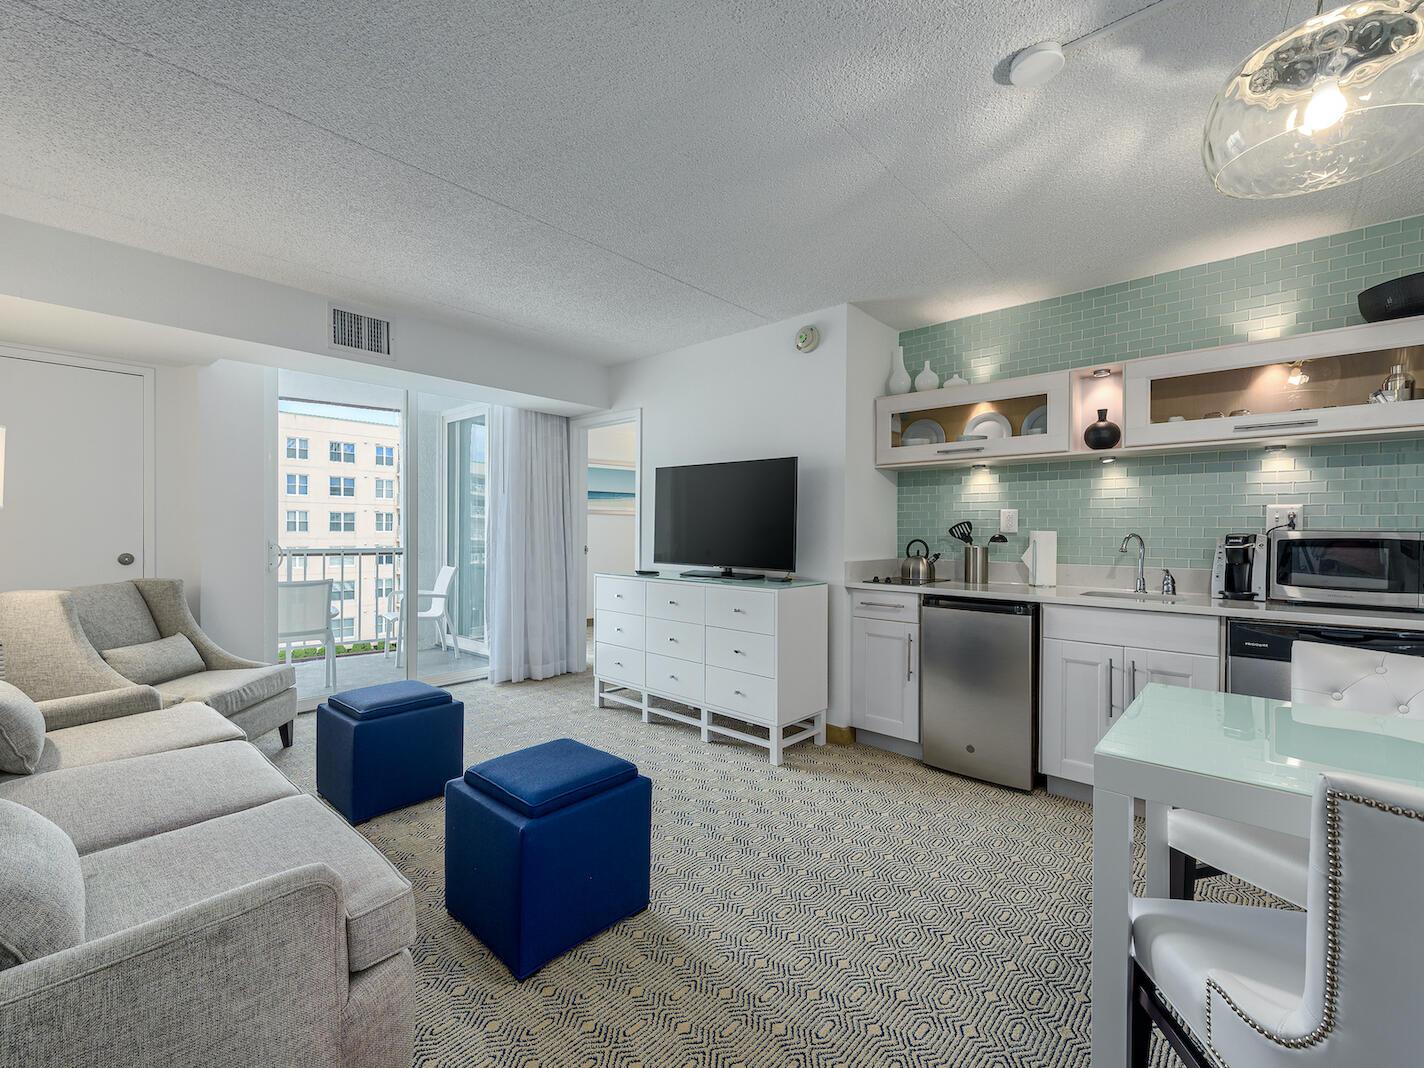 Kitchenette & Living Room Premium Poolside Double Suite at ICONA Diamond Beach Hotel Resort near Wildwood, NJ